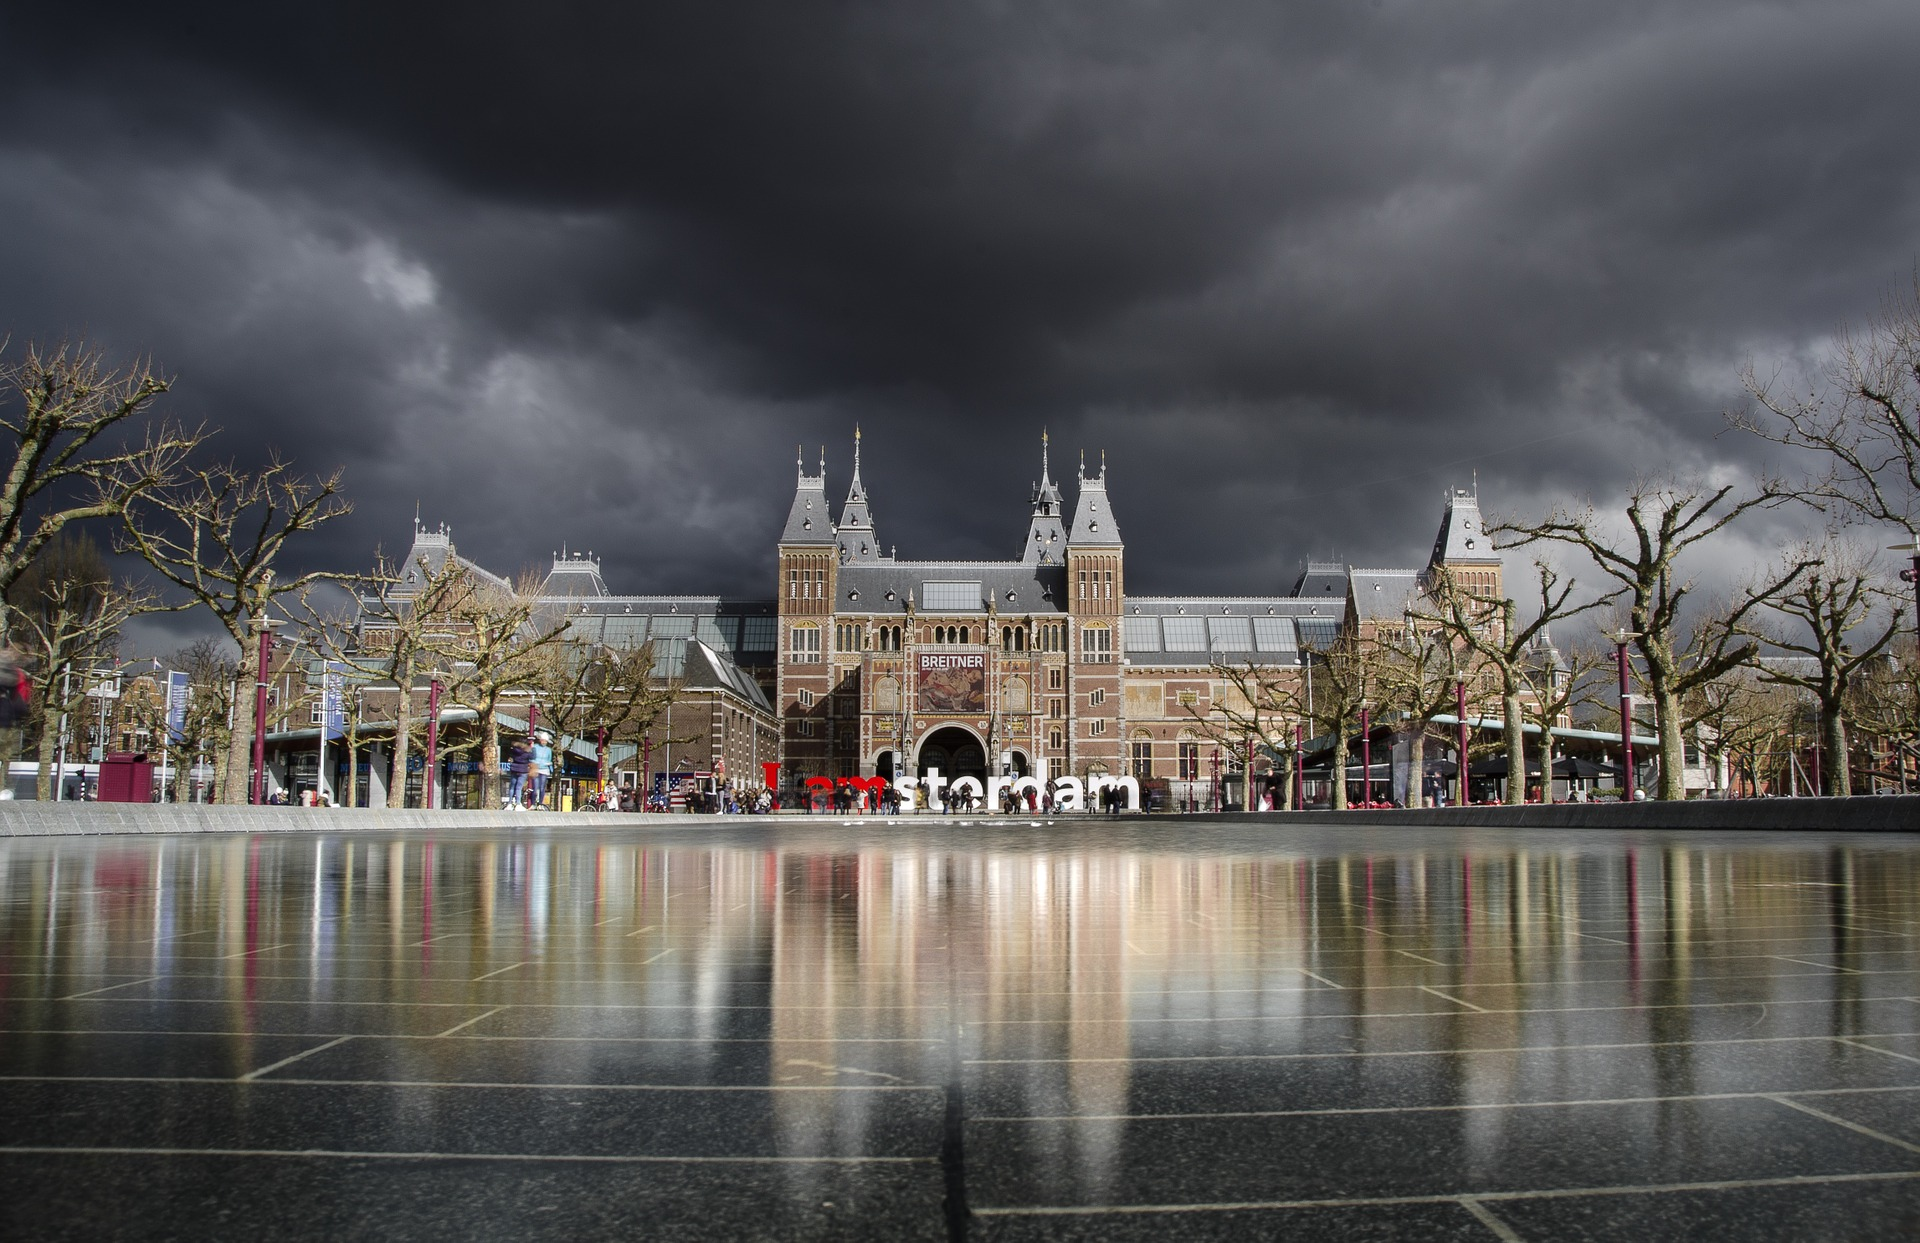 amsterdam-1269462_1920.jpg?1568106010